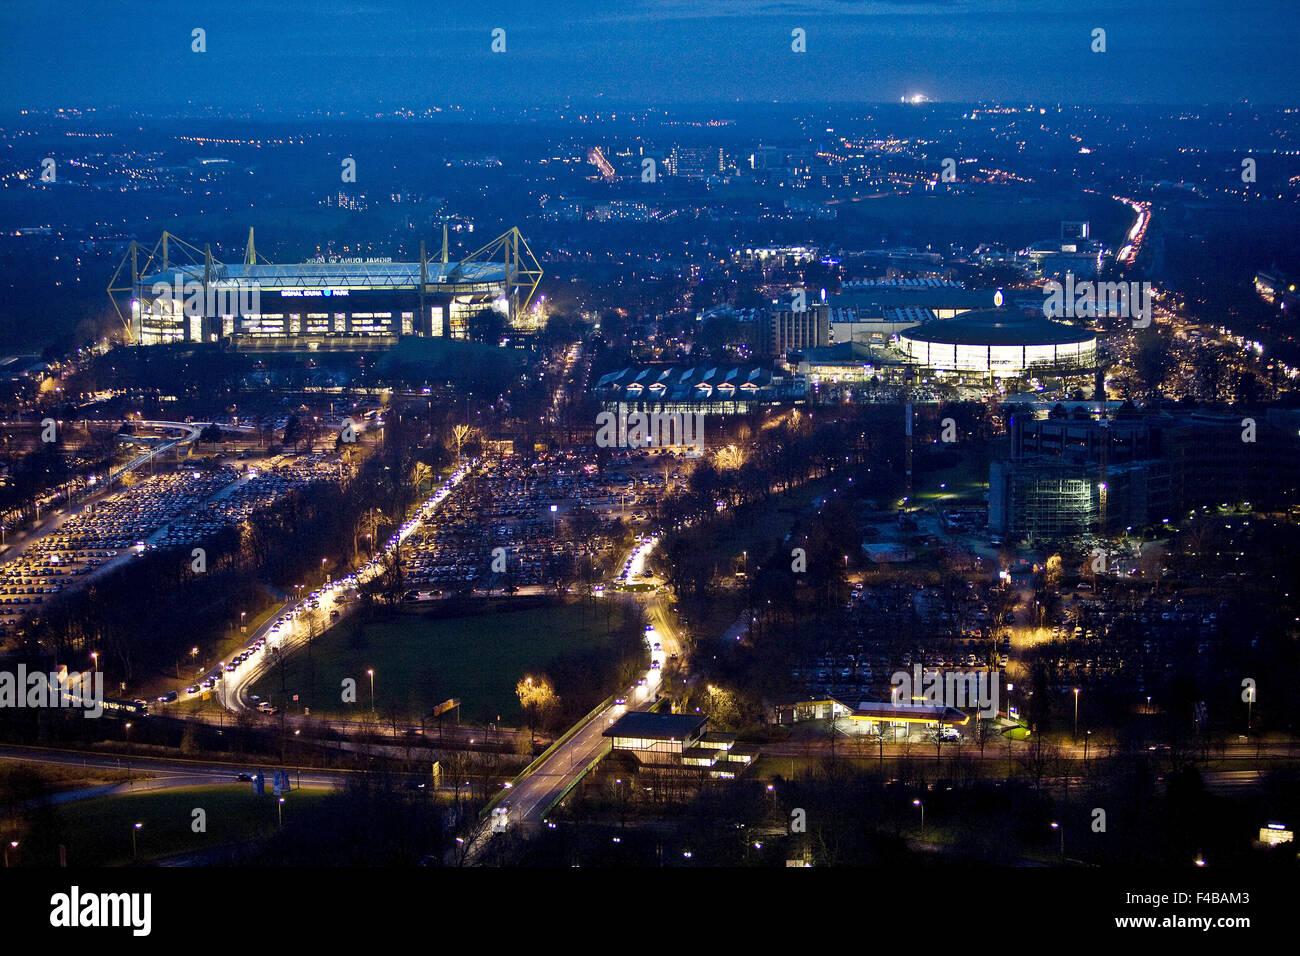 Aerial view at dusk, Dortmund, Germany. - Stock Image